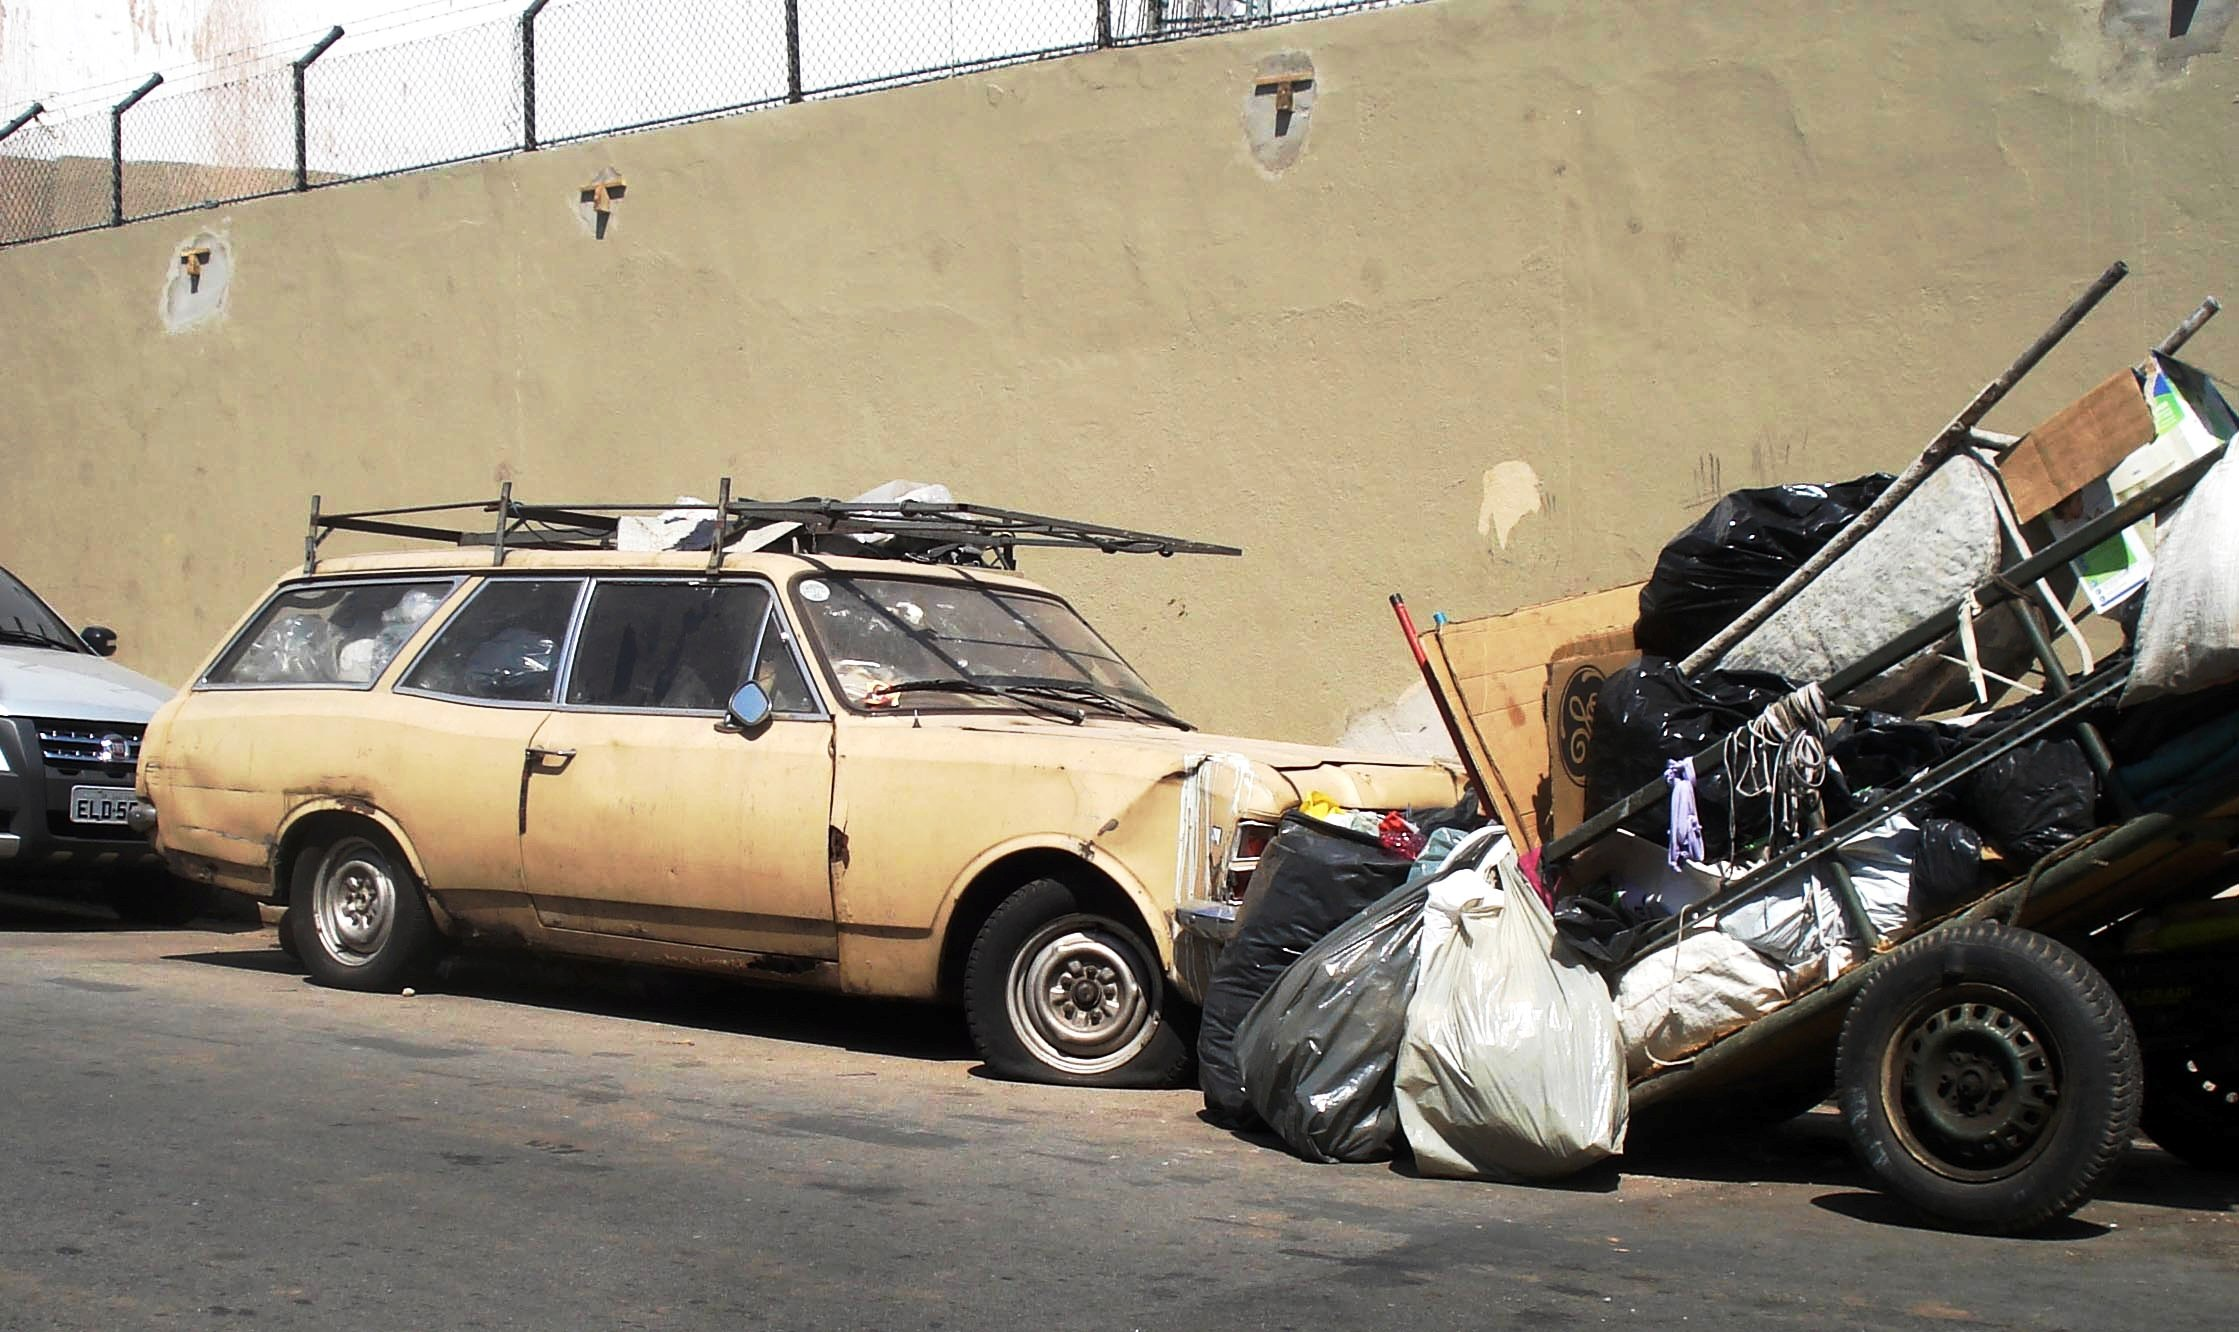 uezio_caravan_s-paulo_sp Chevrolet Caravan